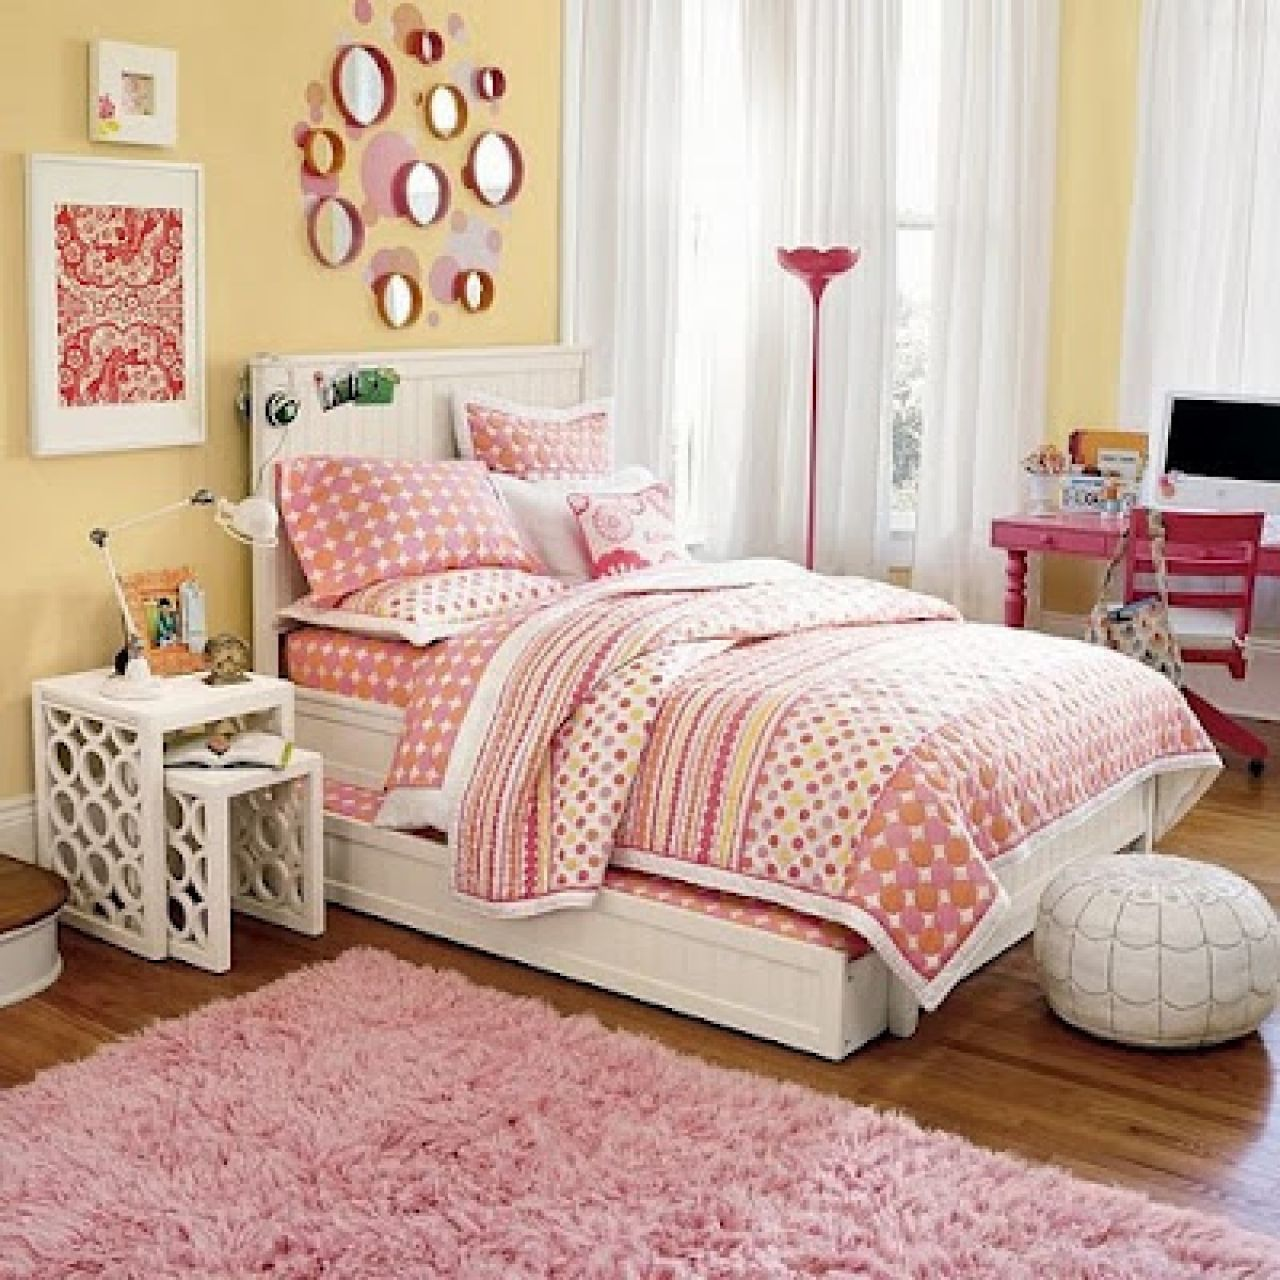 17 Best images about Teenage Girls Bedroom on Pinterest   Furniture  Empty  frames and Tween. 17 Best images about Teenage Girls Bedroom on Pinterest